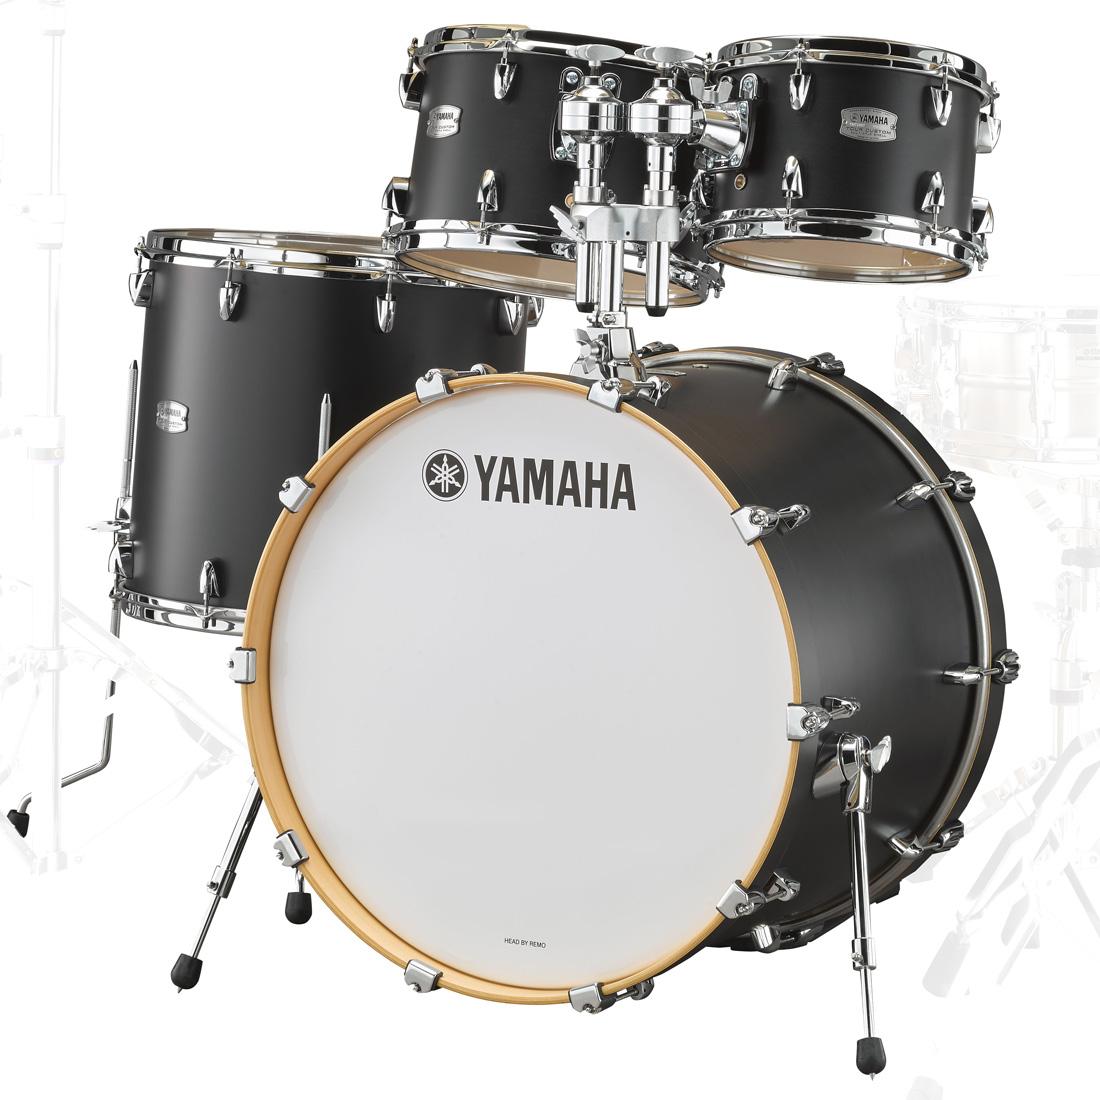 YAMAHA / TMP2F4LCS ヤマハ Tour Custom ドラムシェルパック 22BD リコライスサテン【お取り寄せ商品】